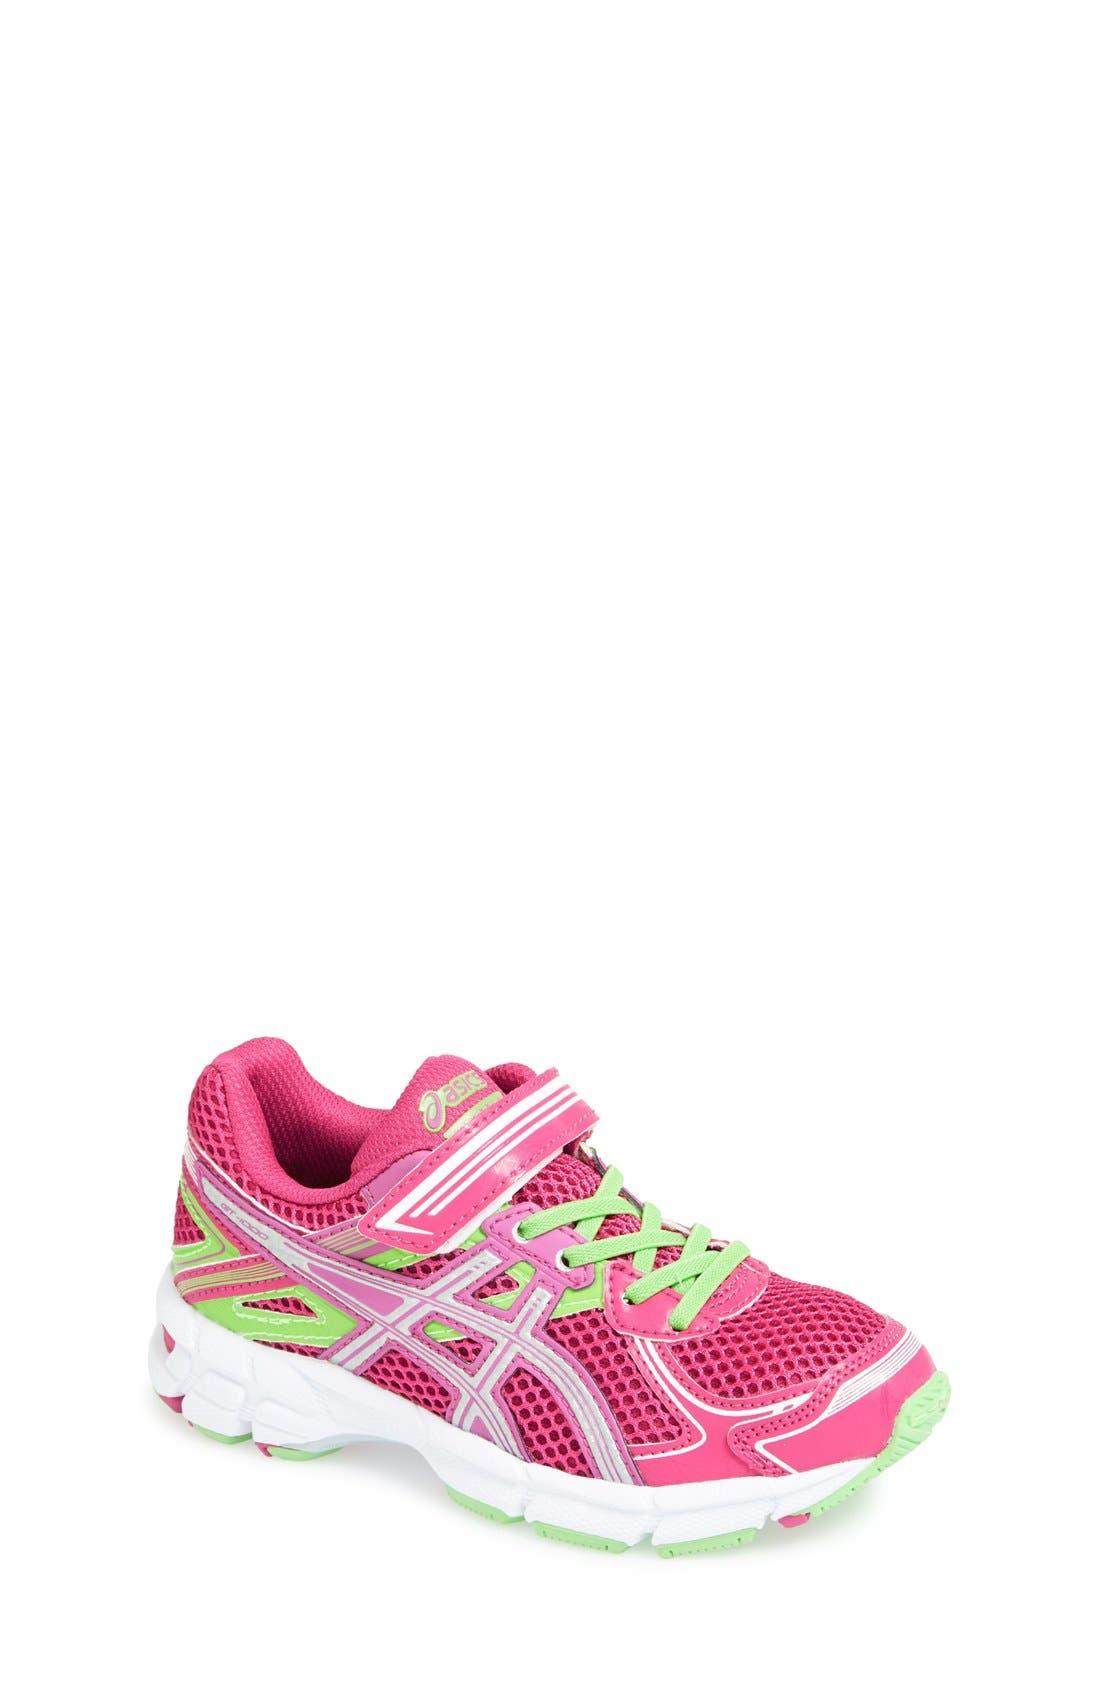 Main Image - ASICS® 'GT-1000™' Running Shoe (Toddler & Little Kid)